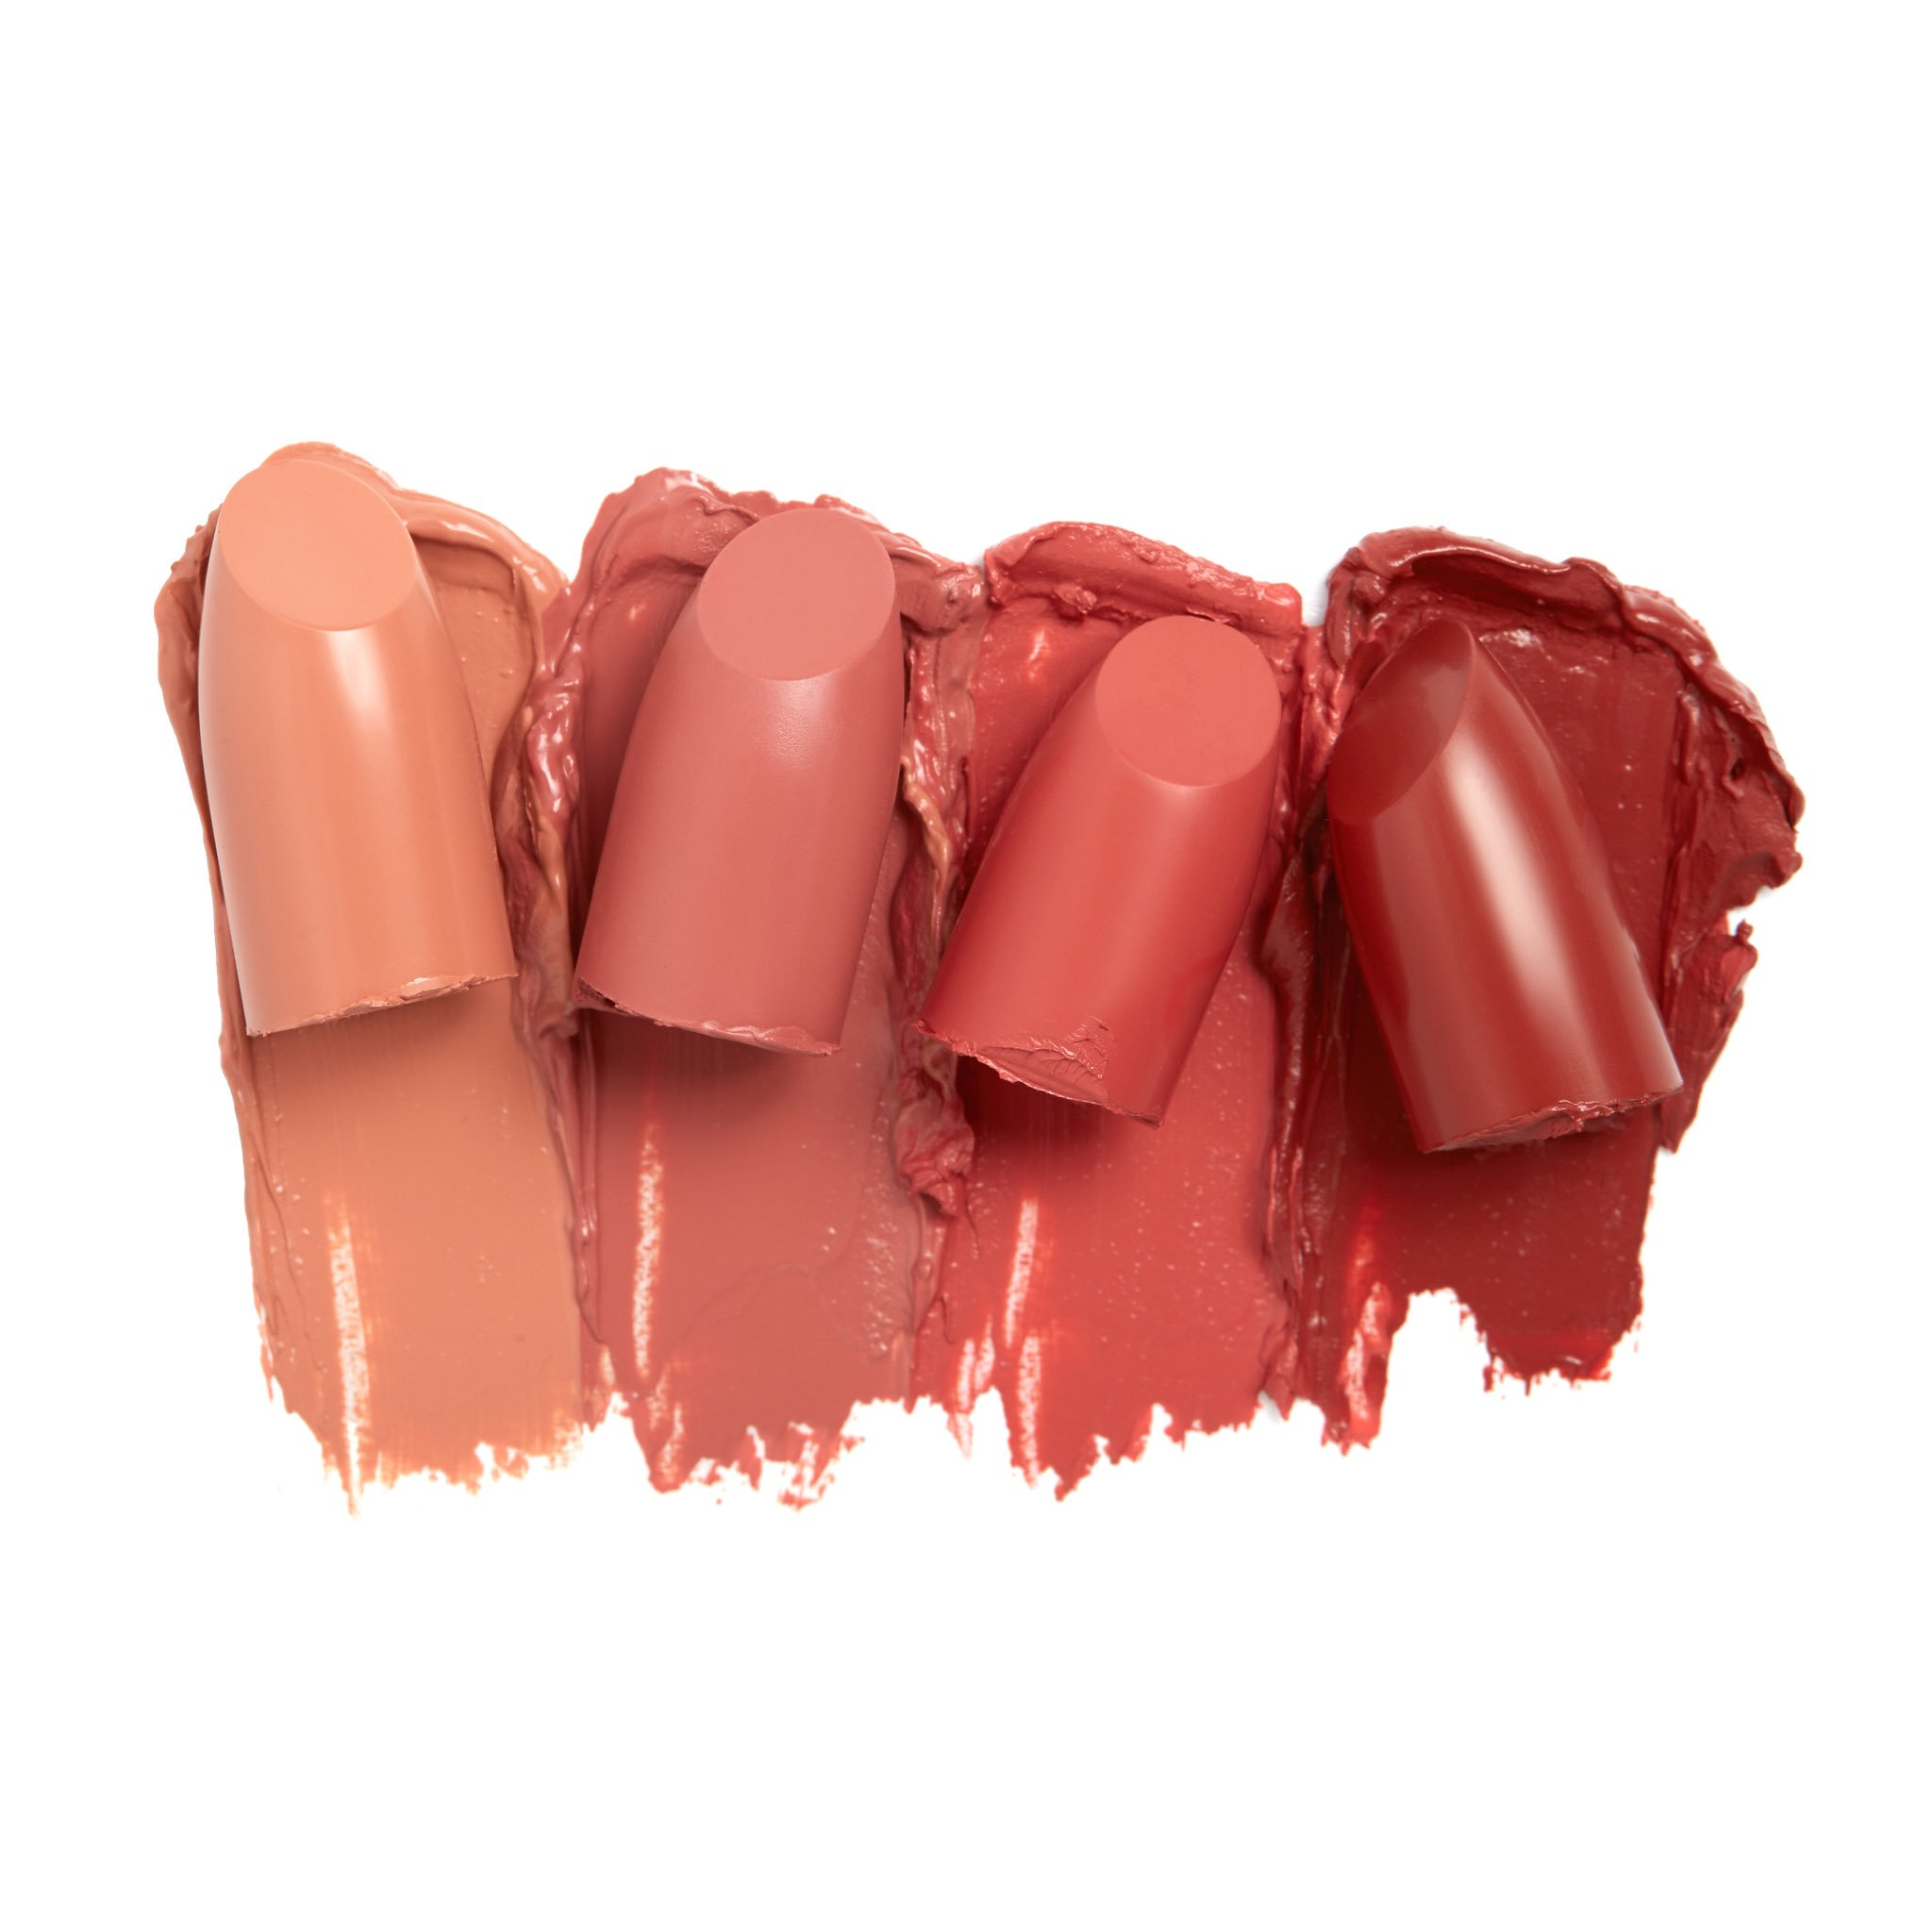 Crème Lipsticks in Peach 1-4. Available tomorrow at https://t.co/32qaKbs5YG at 12PM PST https://t.co/M7e1Sec0Mo